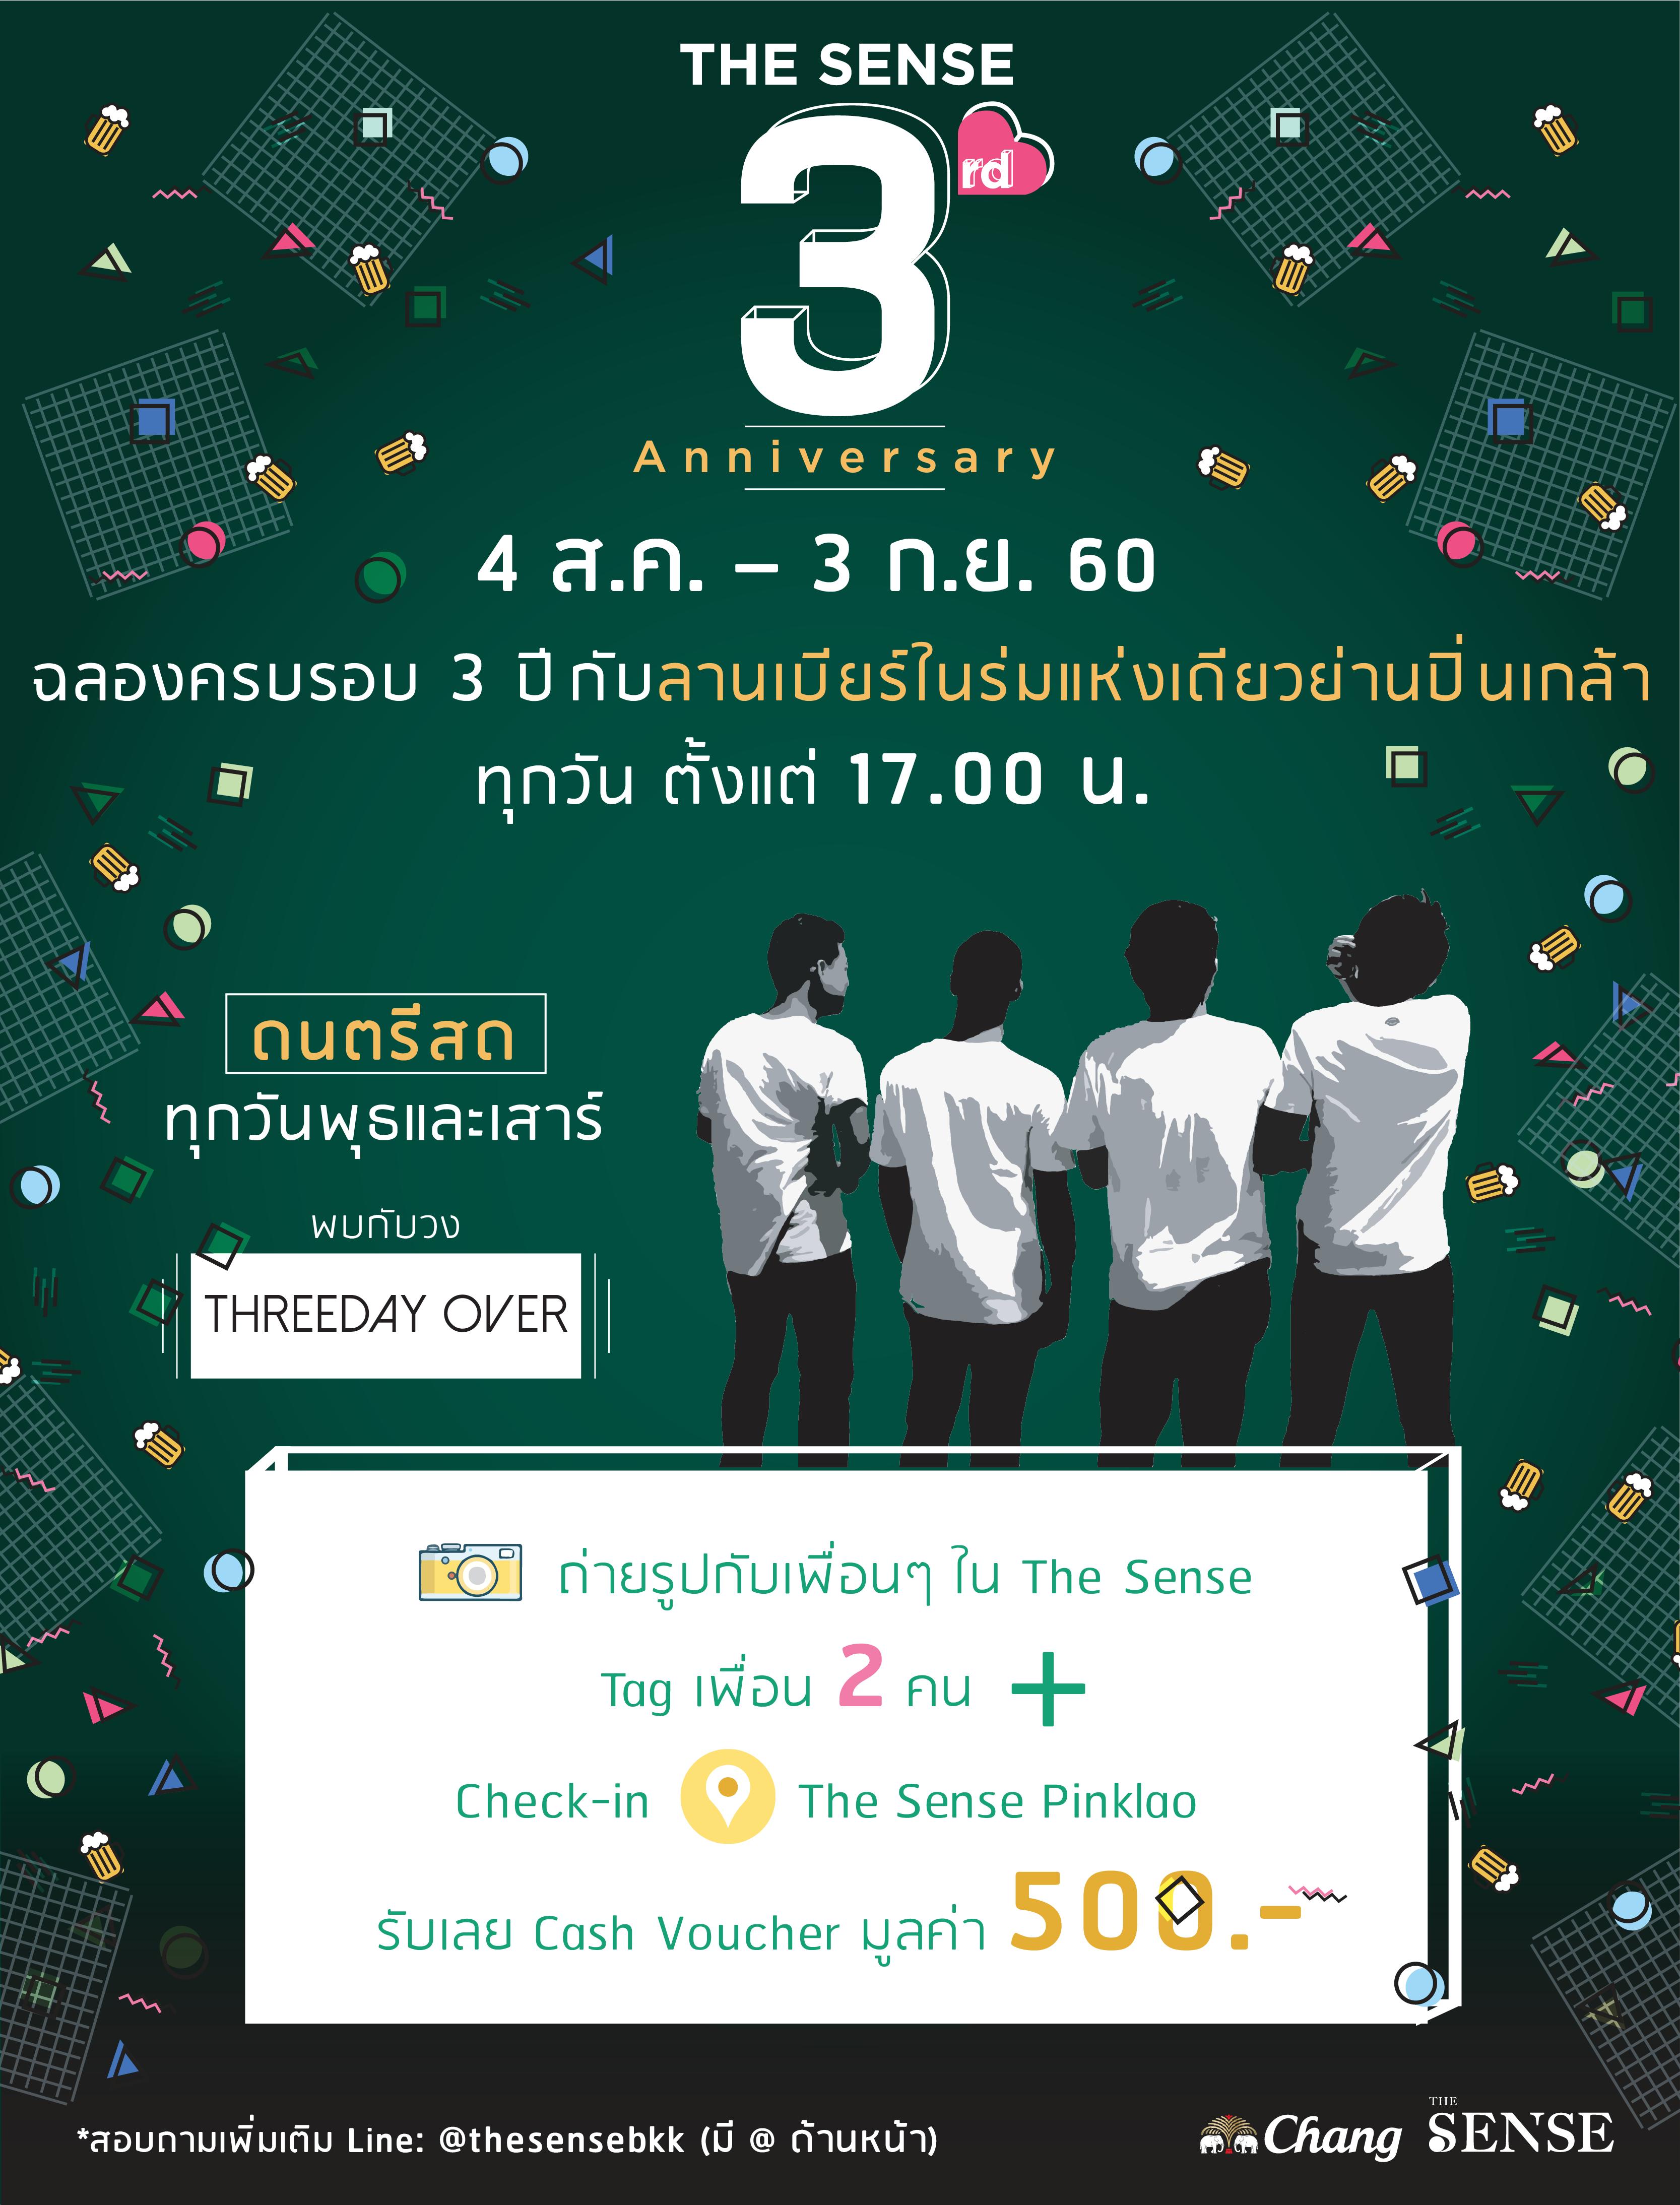 TheSense The Sense 3rd Anniversary